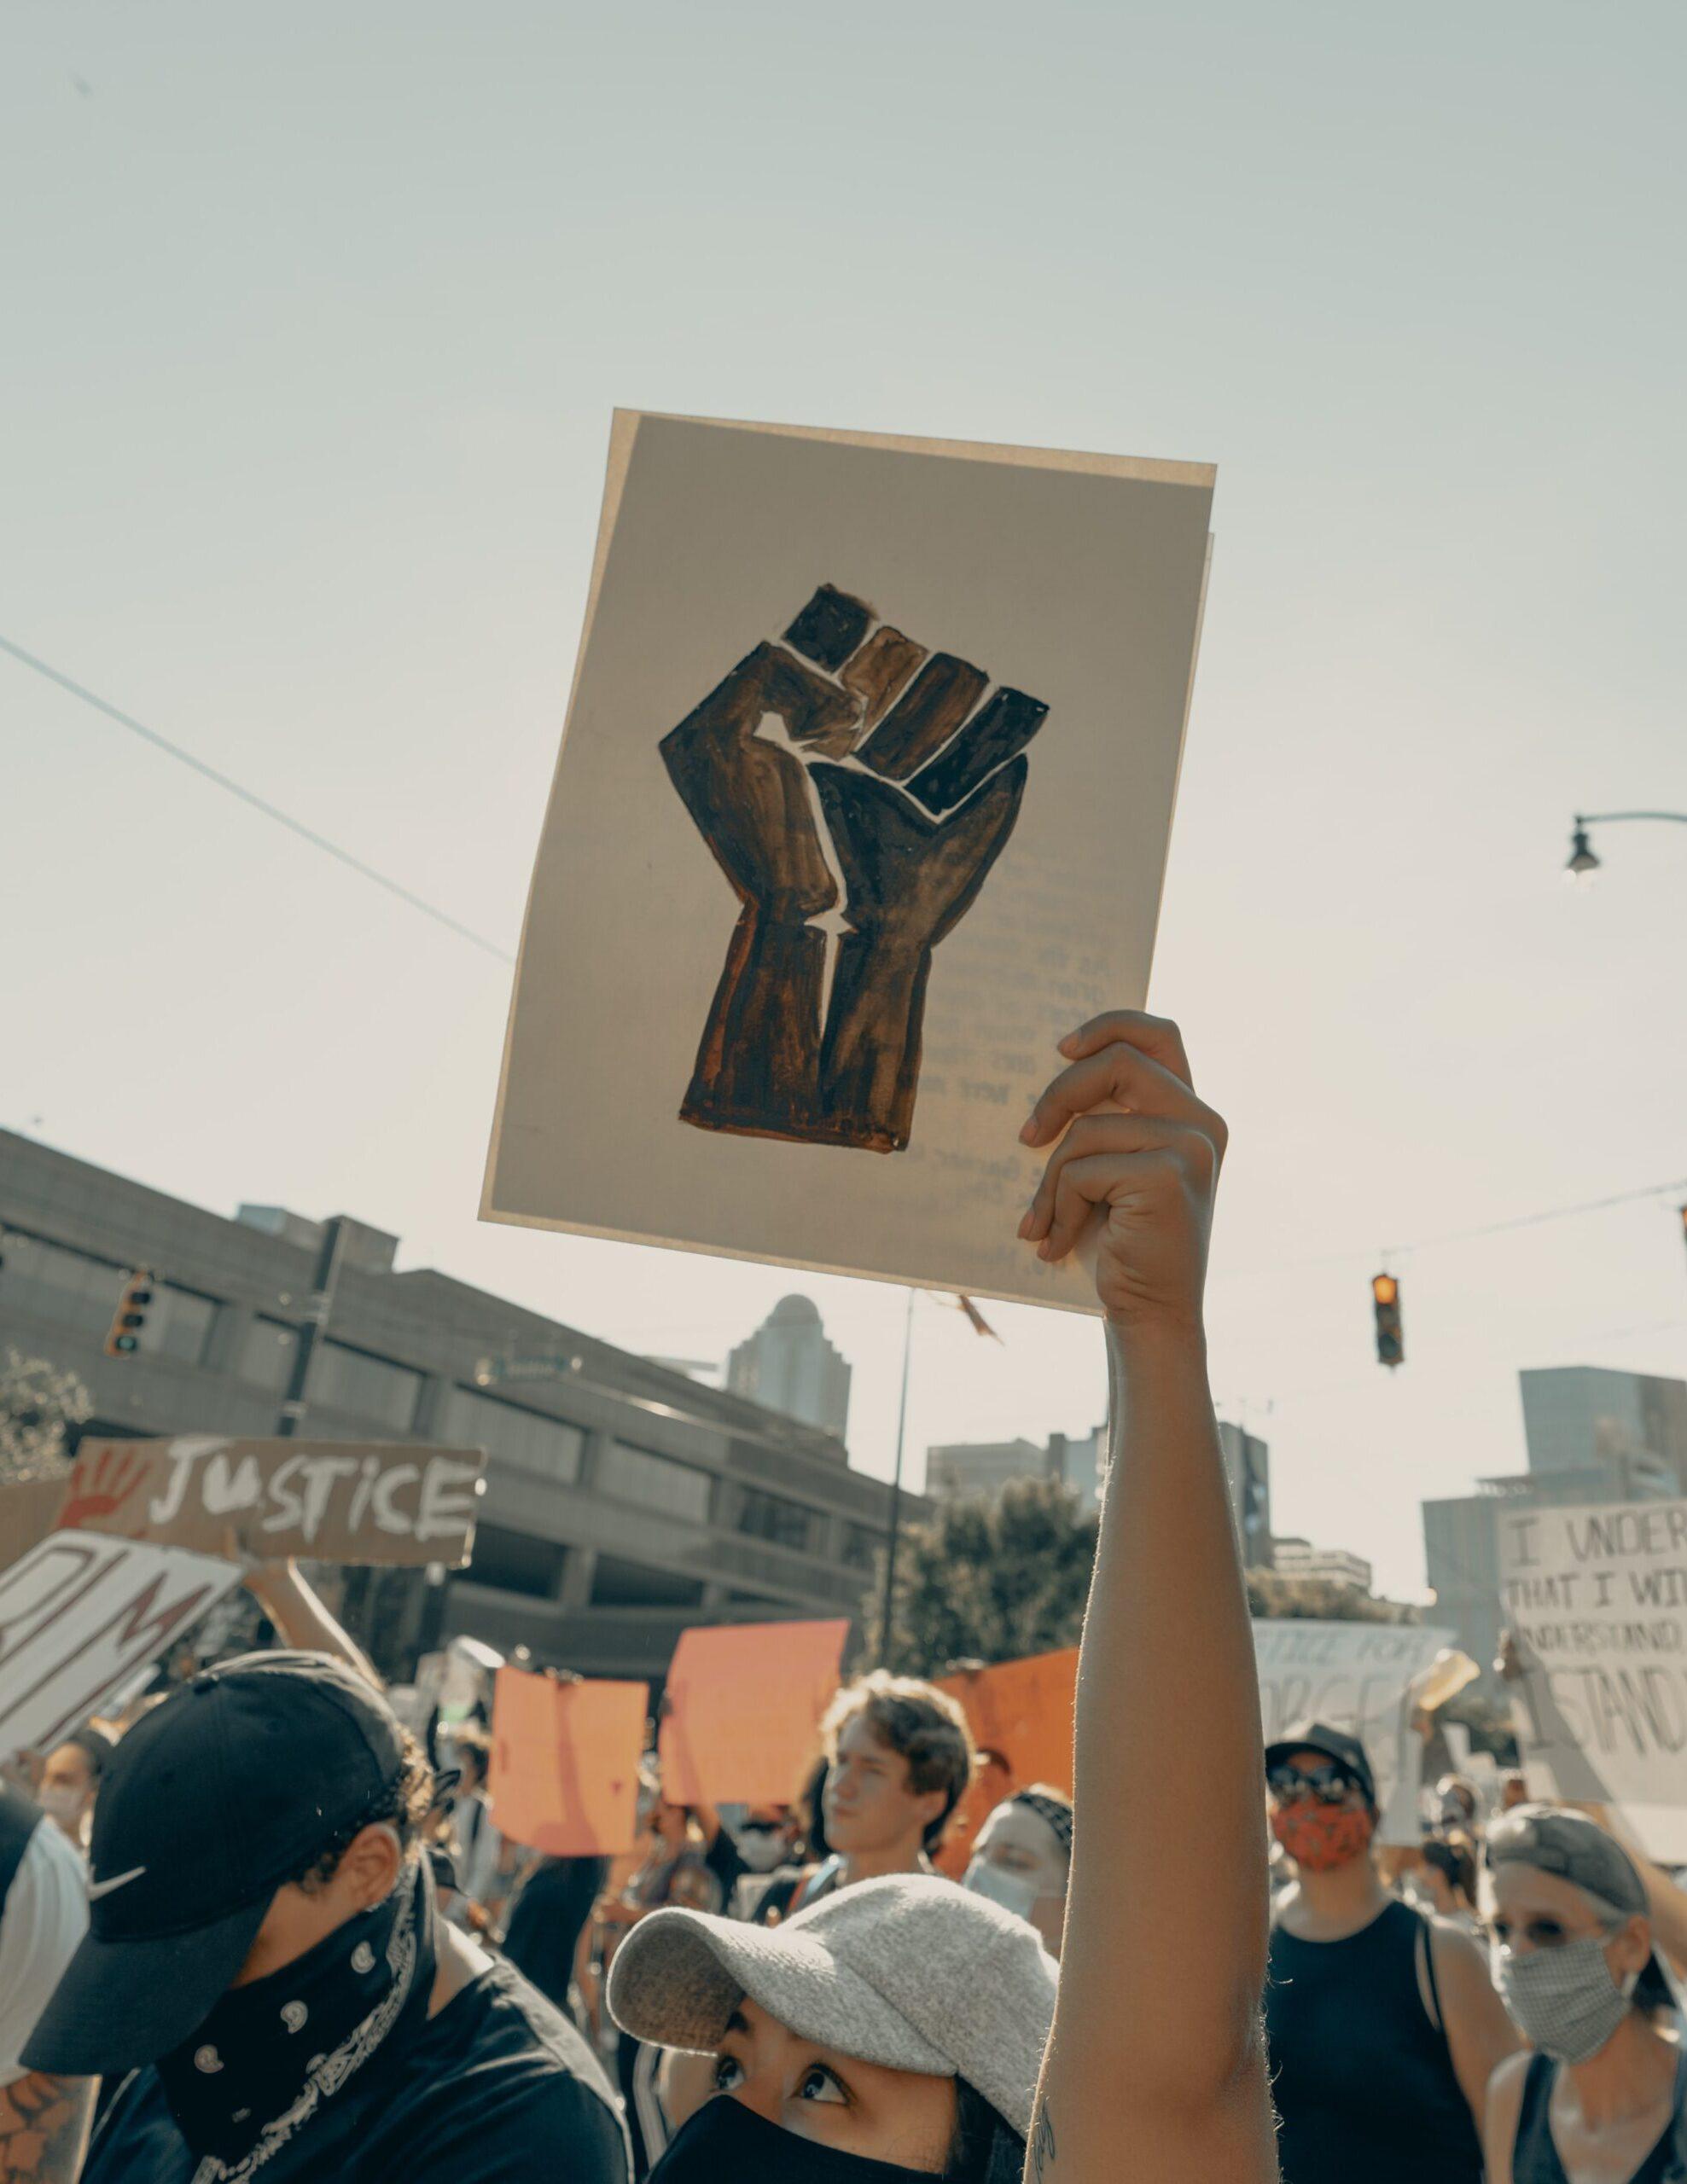 History, Justice, & Politics